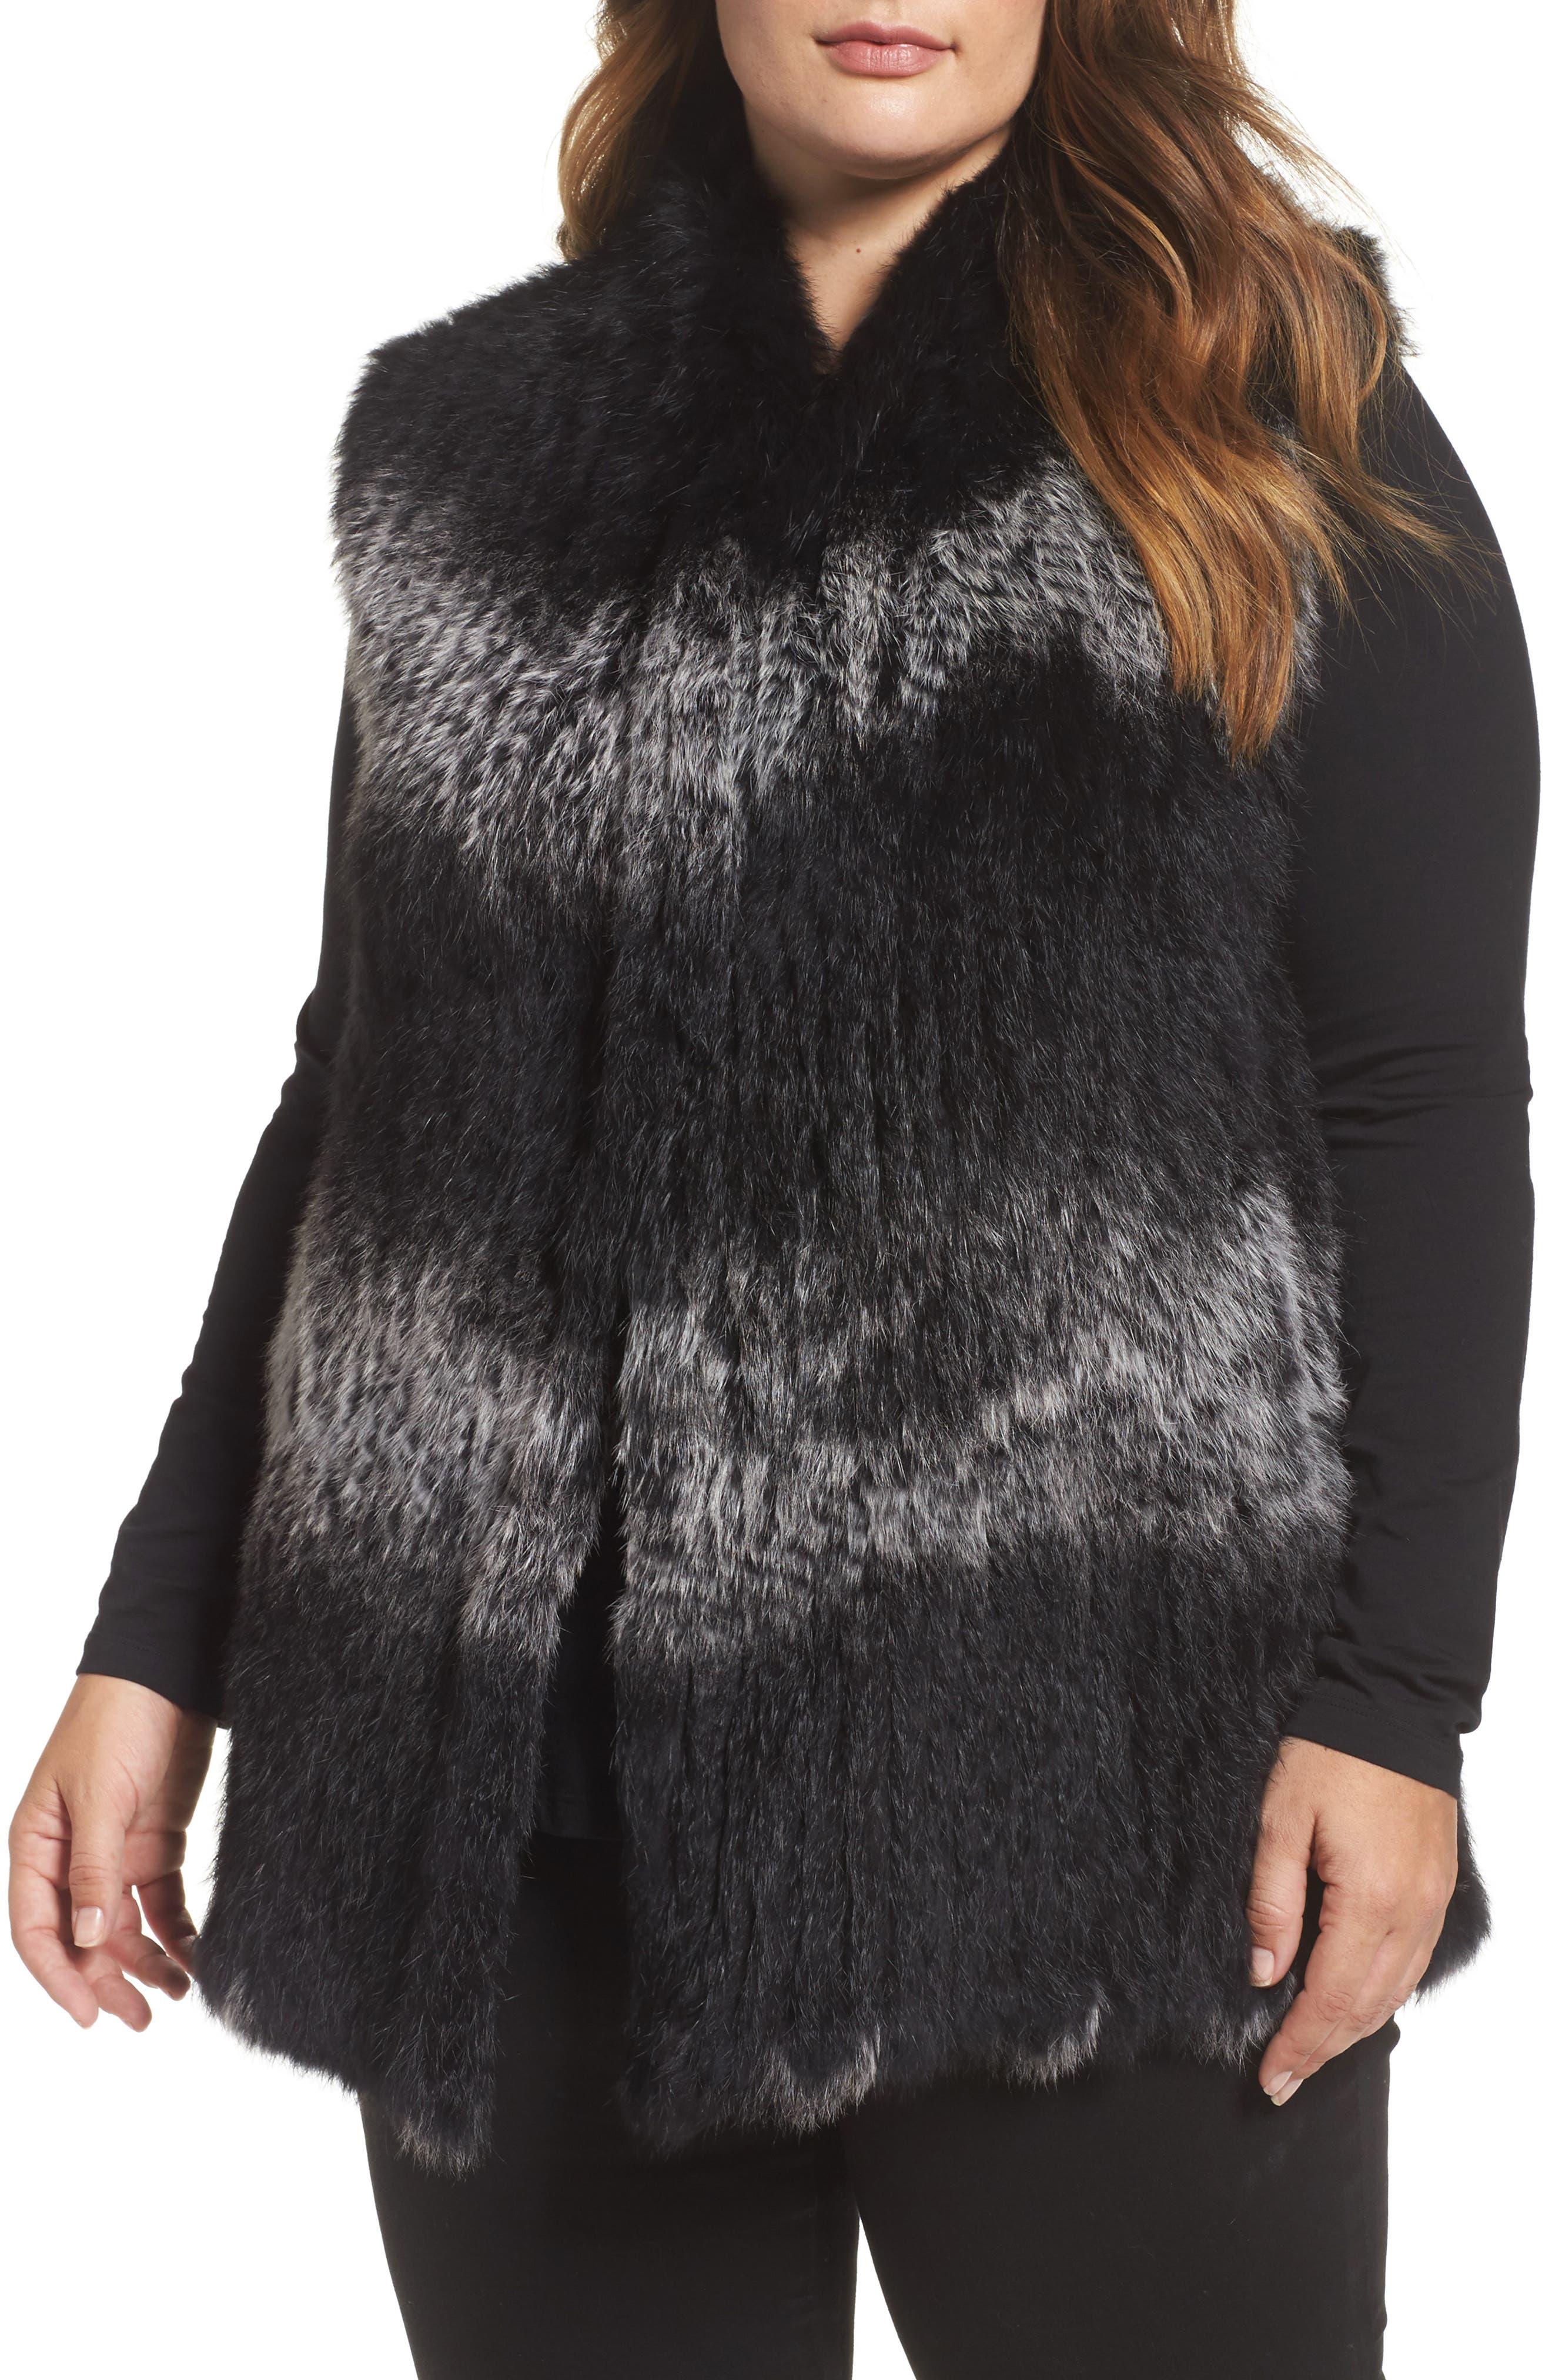 Alternate Image 1 Selected - Love Token Genuine Rabbit Fur Vest (Plus Size)